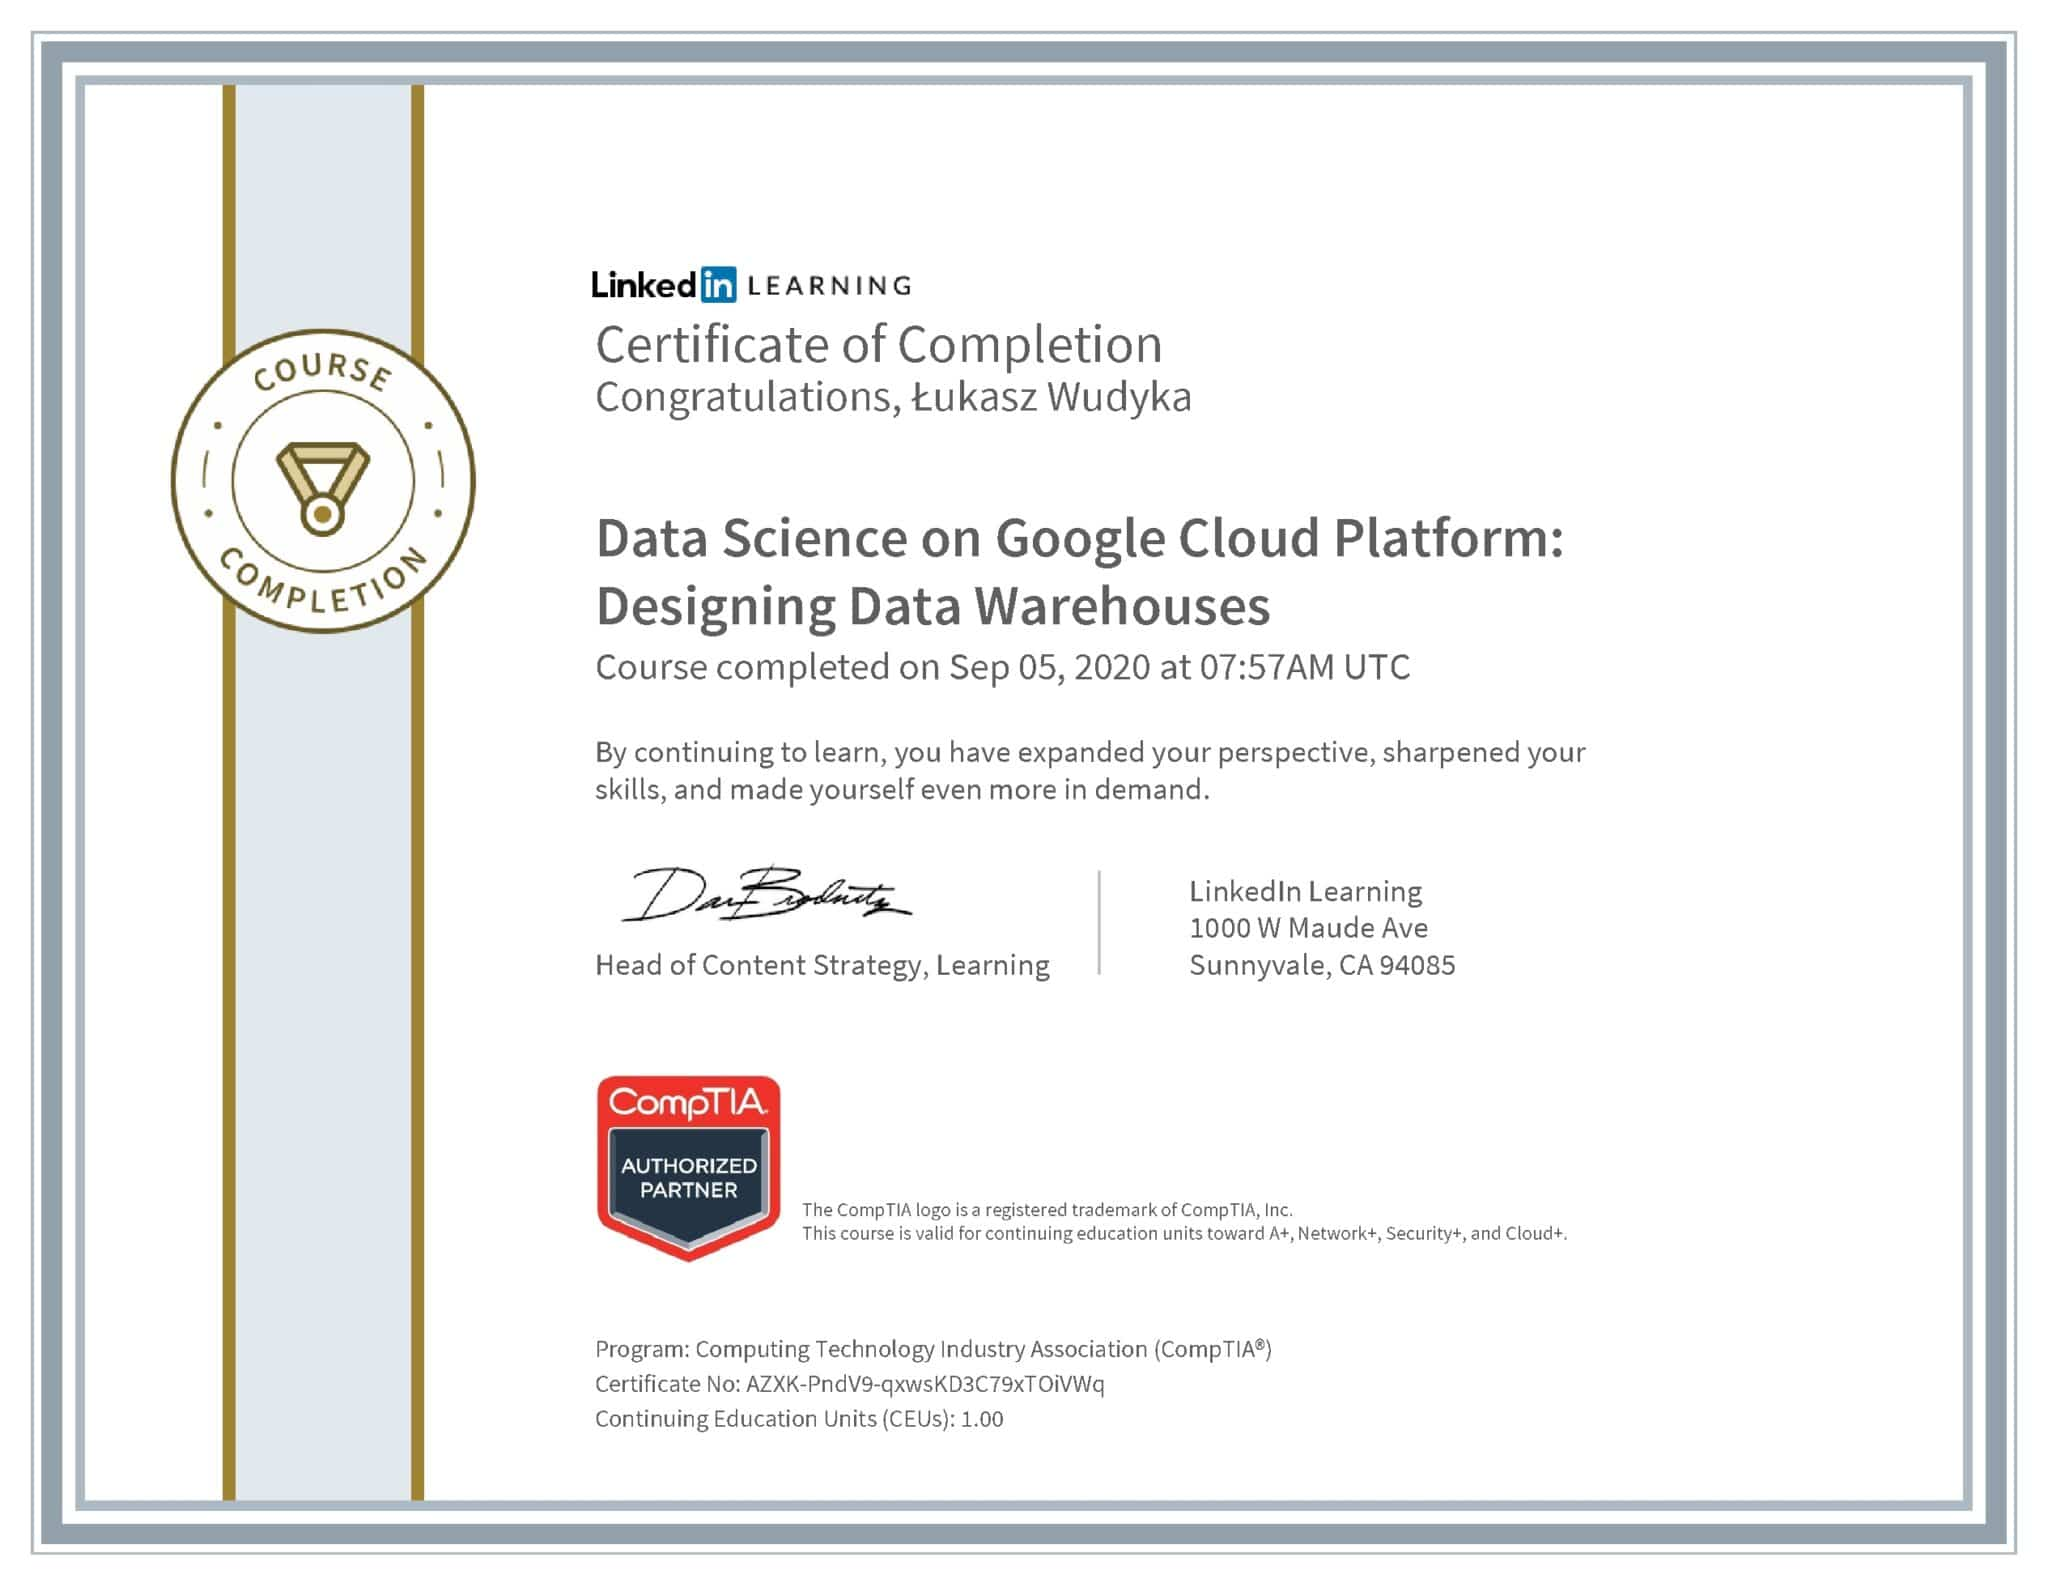 Łukasz Wudyka certyfikat LinkedIn Data Science on Google Cloud Platform: Designing Data Warehouses CompTIA